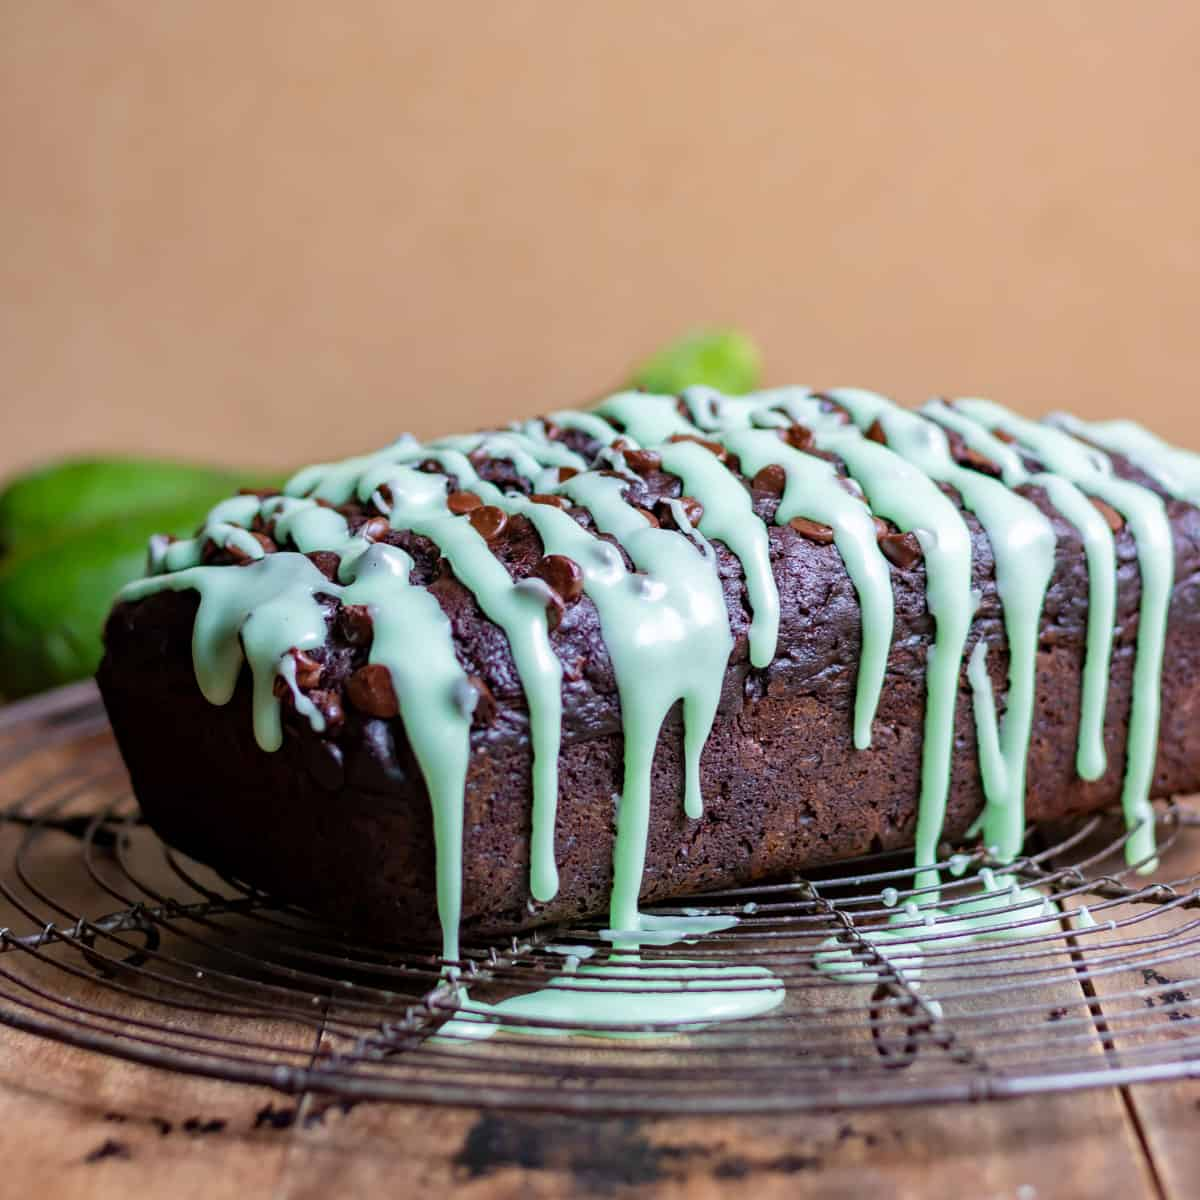 Chocolate Zucchini Bread on a wire rack with a vanilla drizzle.